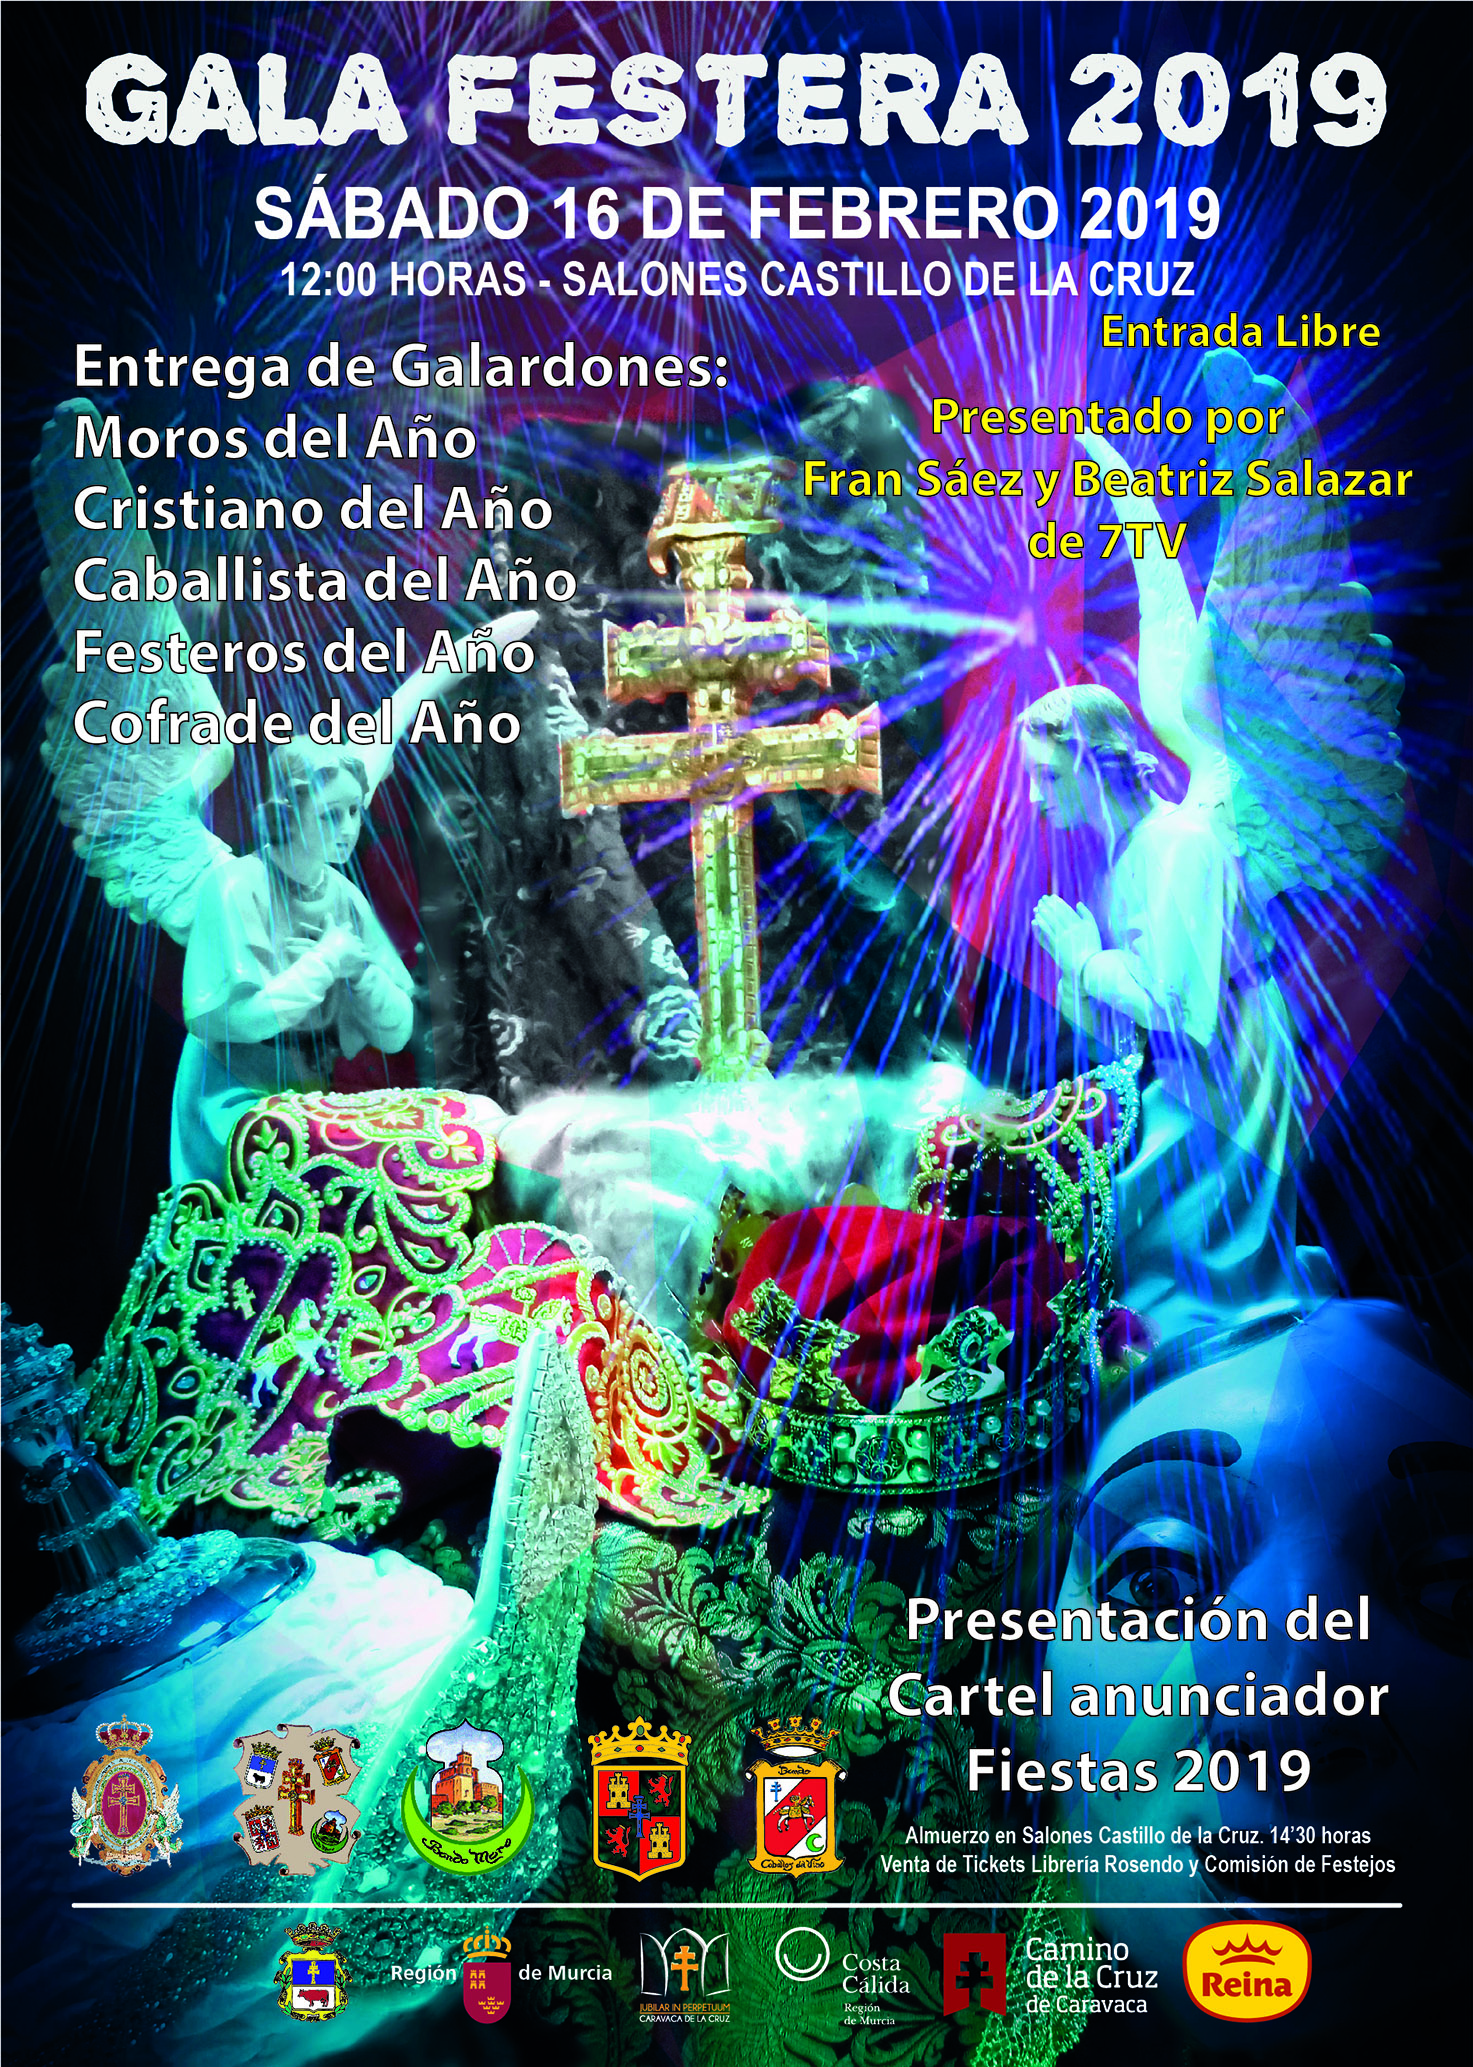 Gala Festera 2019